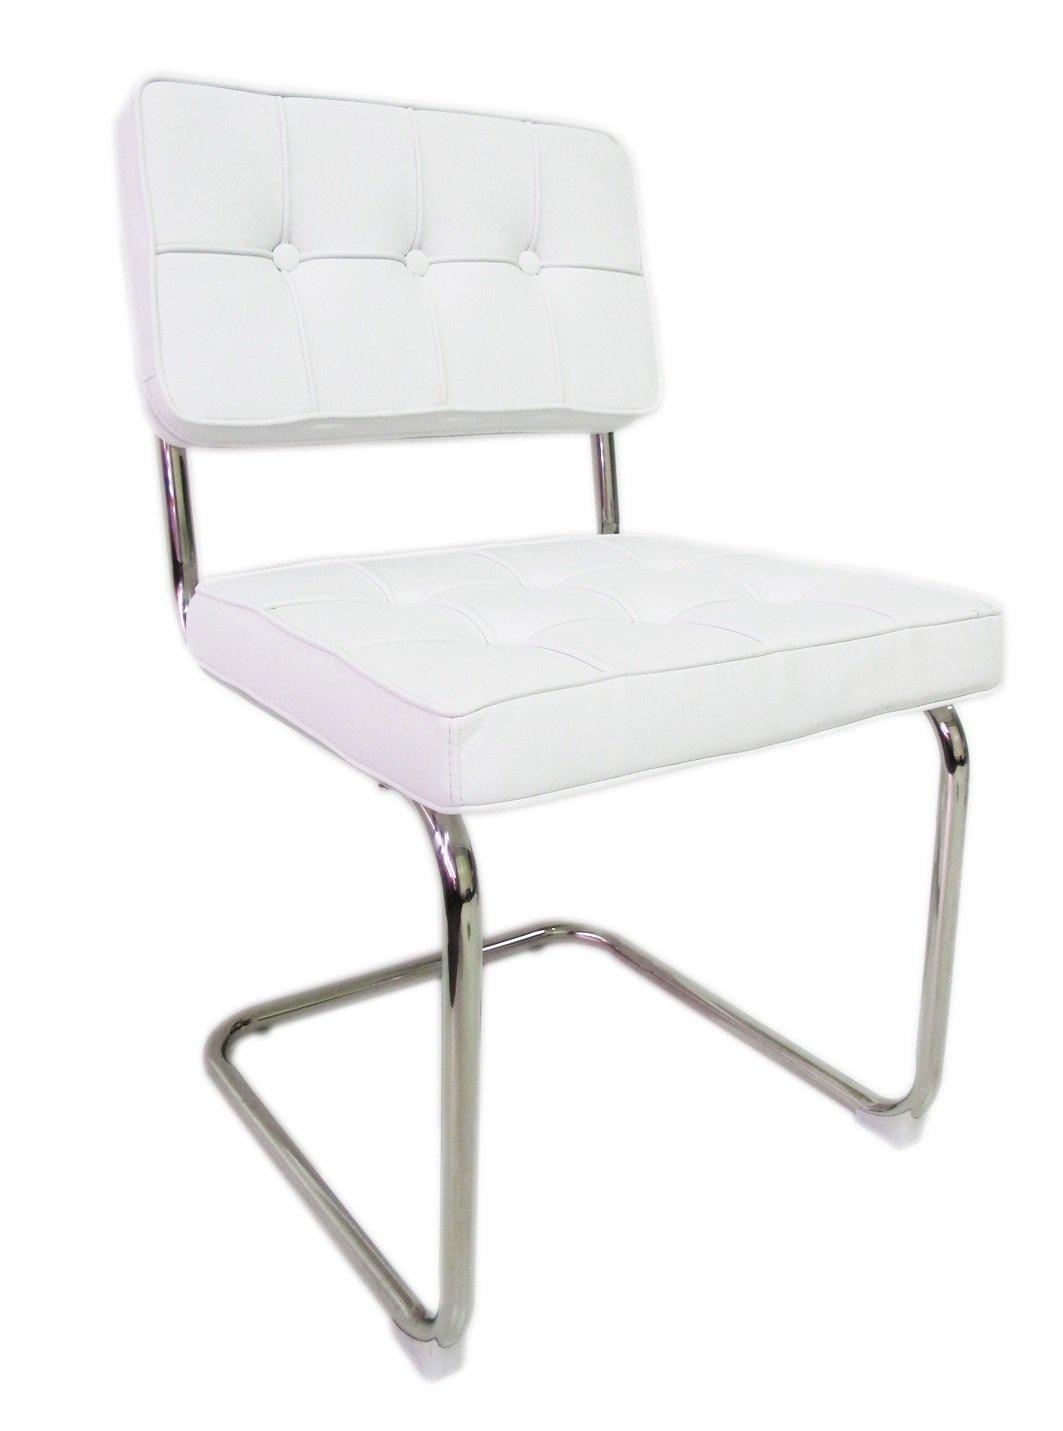 Bauhaus klassieker stoel cantilever freiswinger for Bauhaus stoel vintage